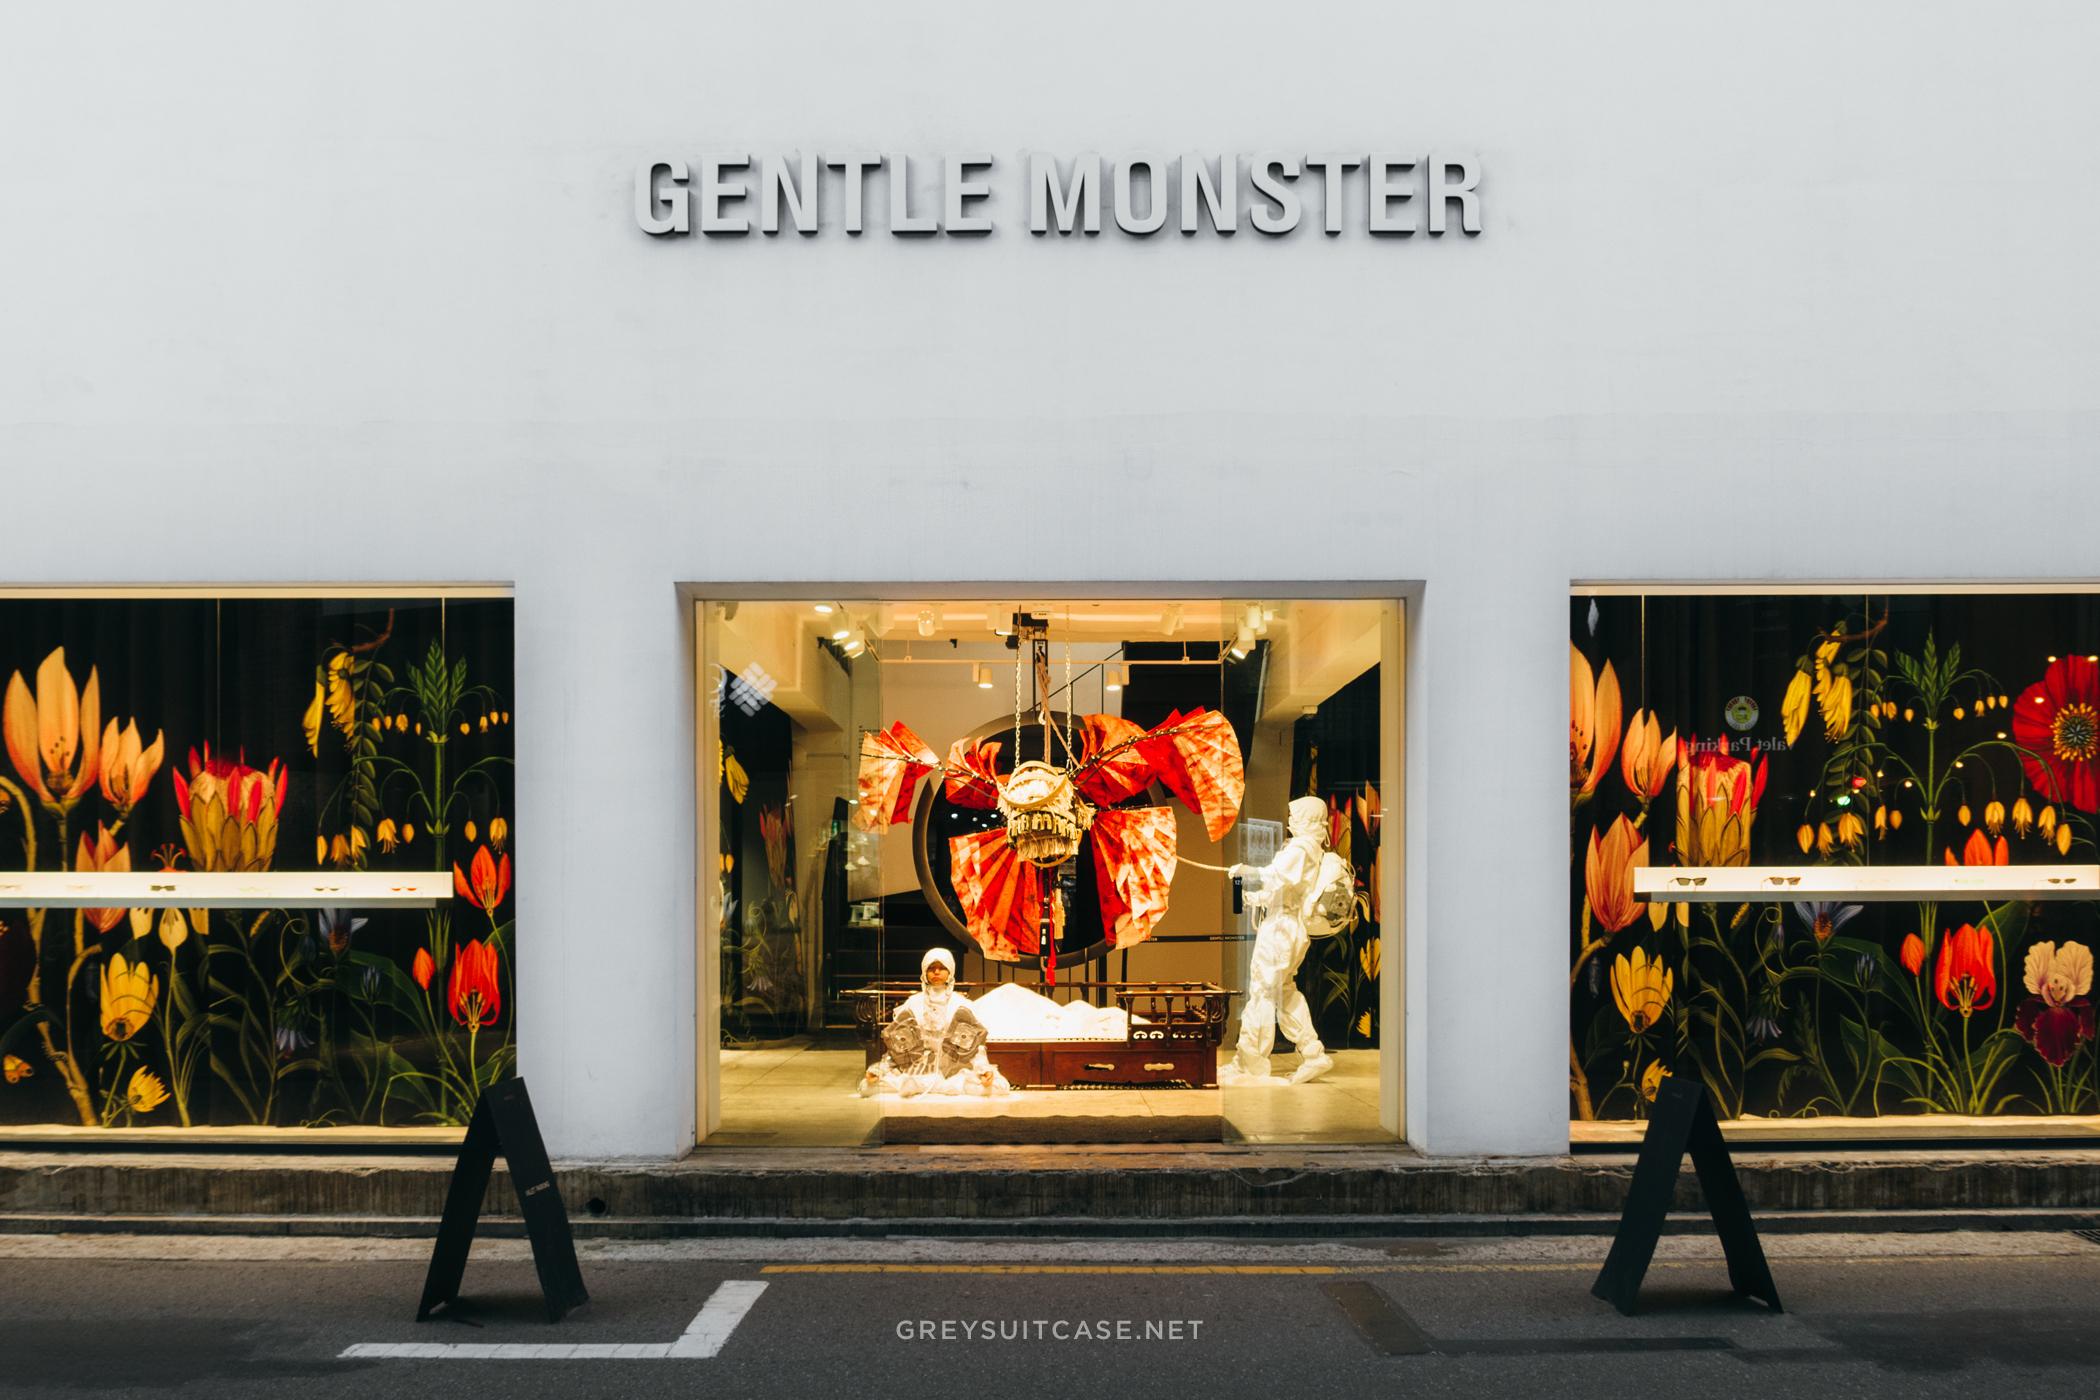 Greysuitcase Seoul Shops Series: Gentle Monster (젠틀몬스터 신사동 플래그십스토어), Garosugil (가로수길), Sinsa-dong (신사동) Seoul, South Korea.